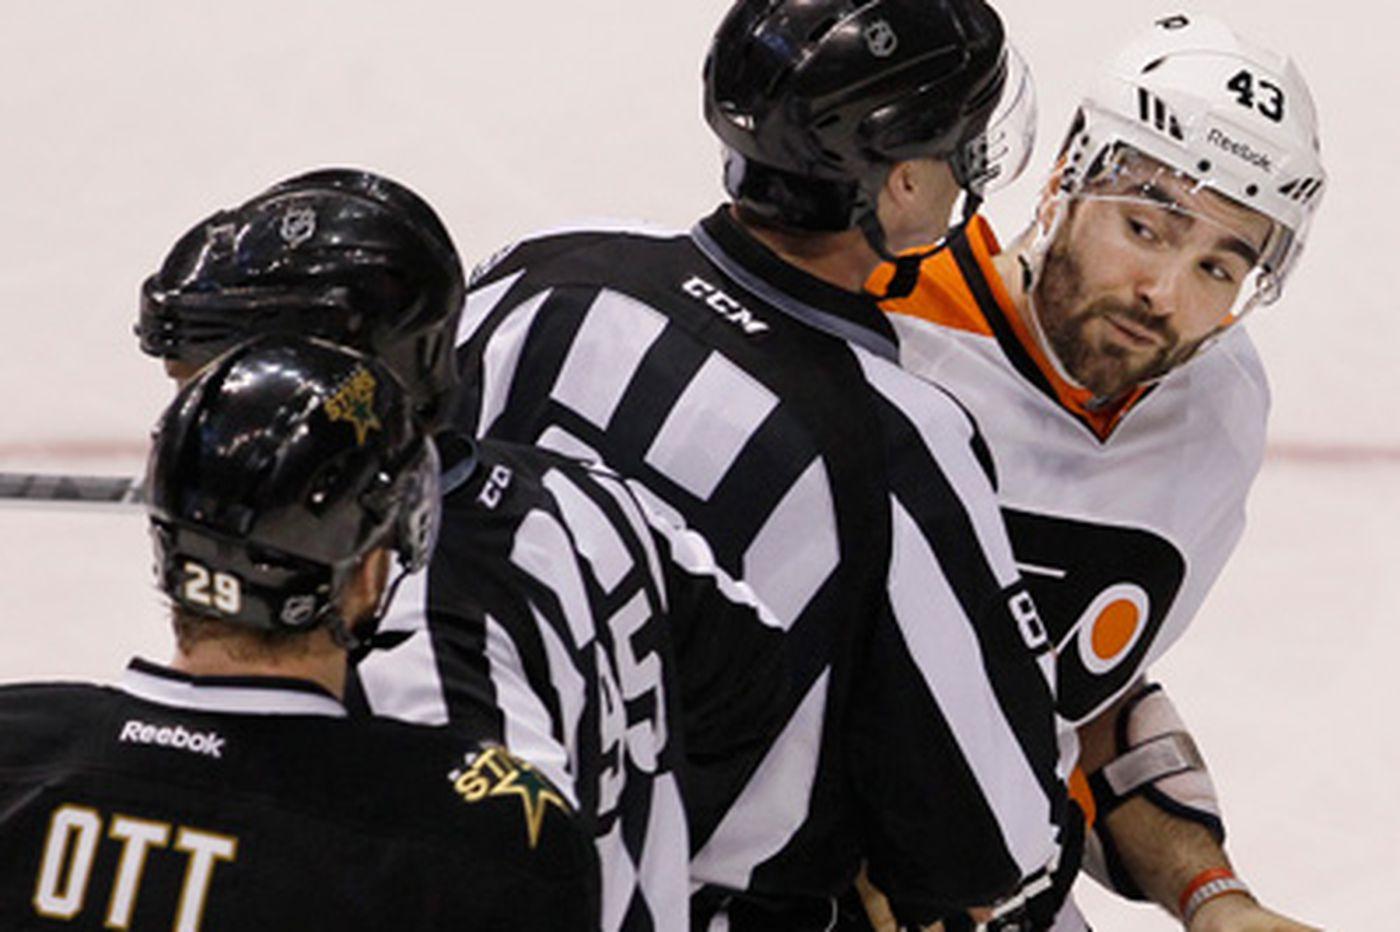 A chip shot between Flyers' Laviolette, Dallas' Ott